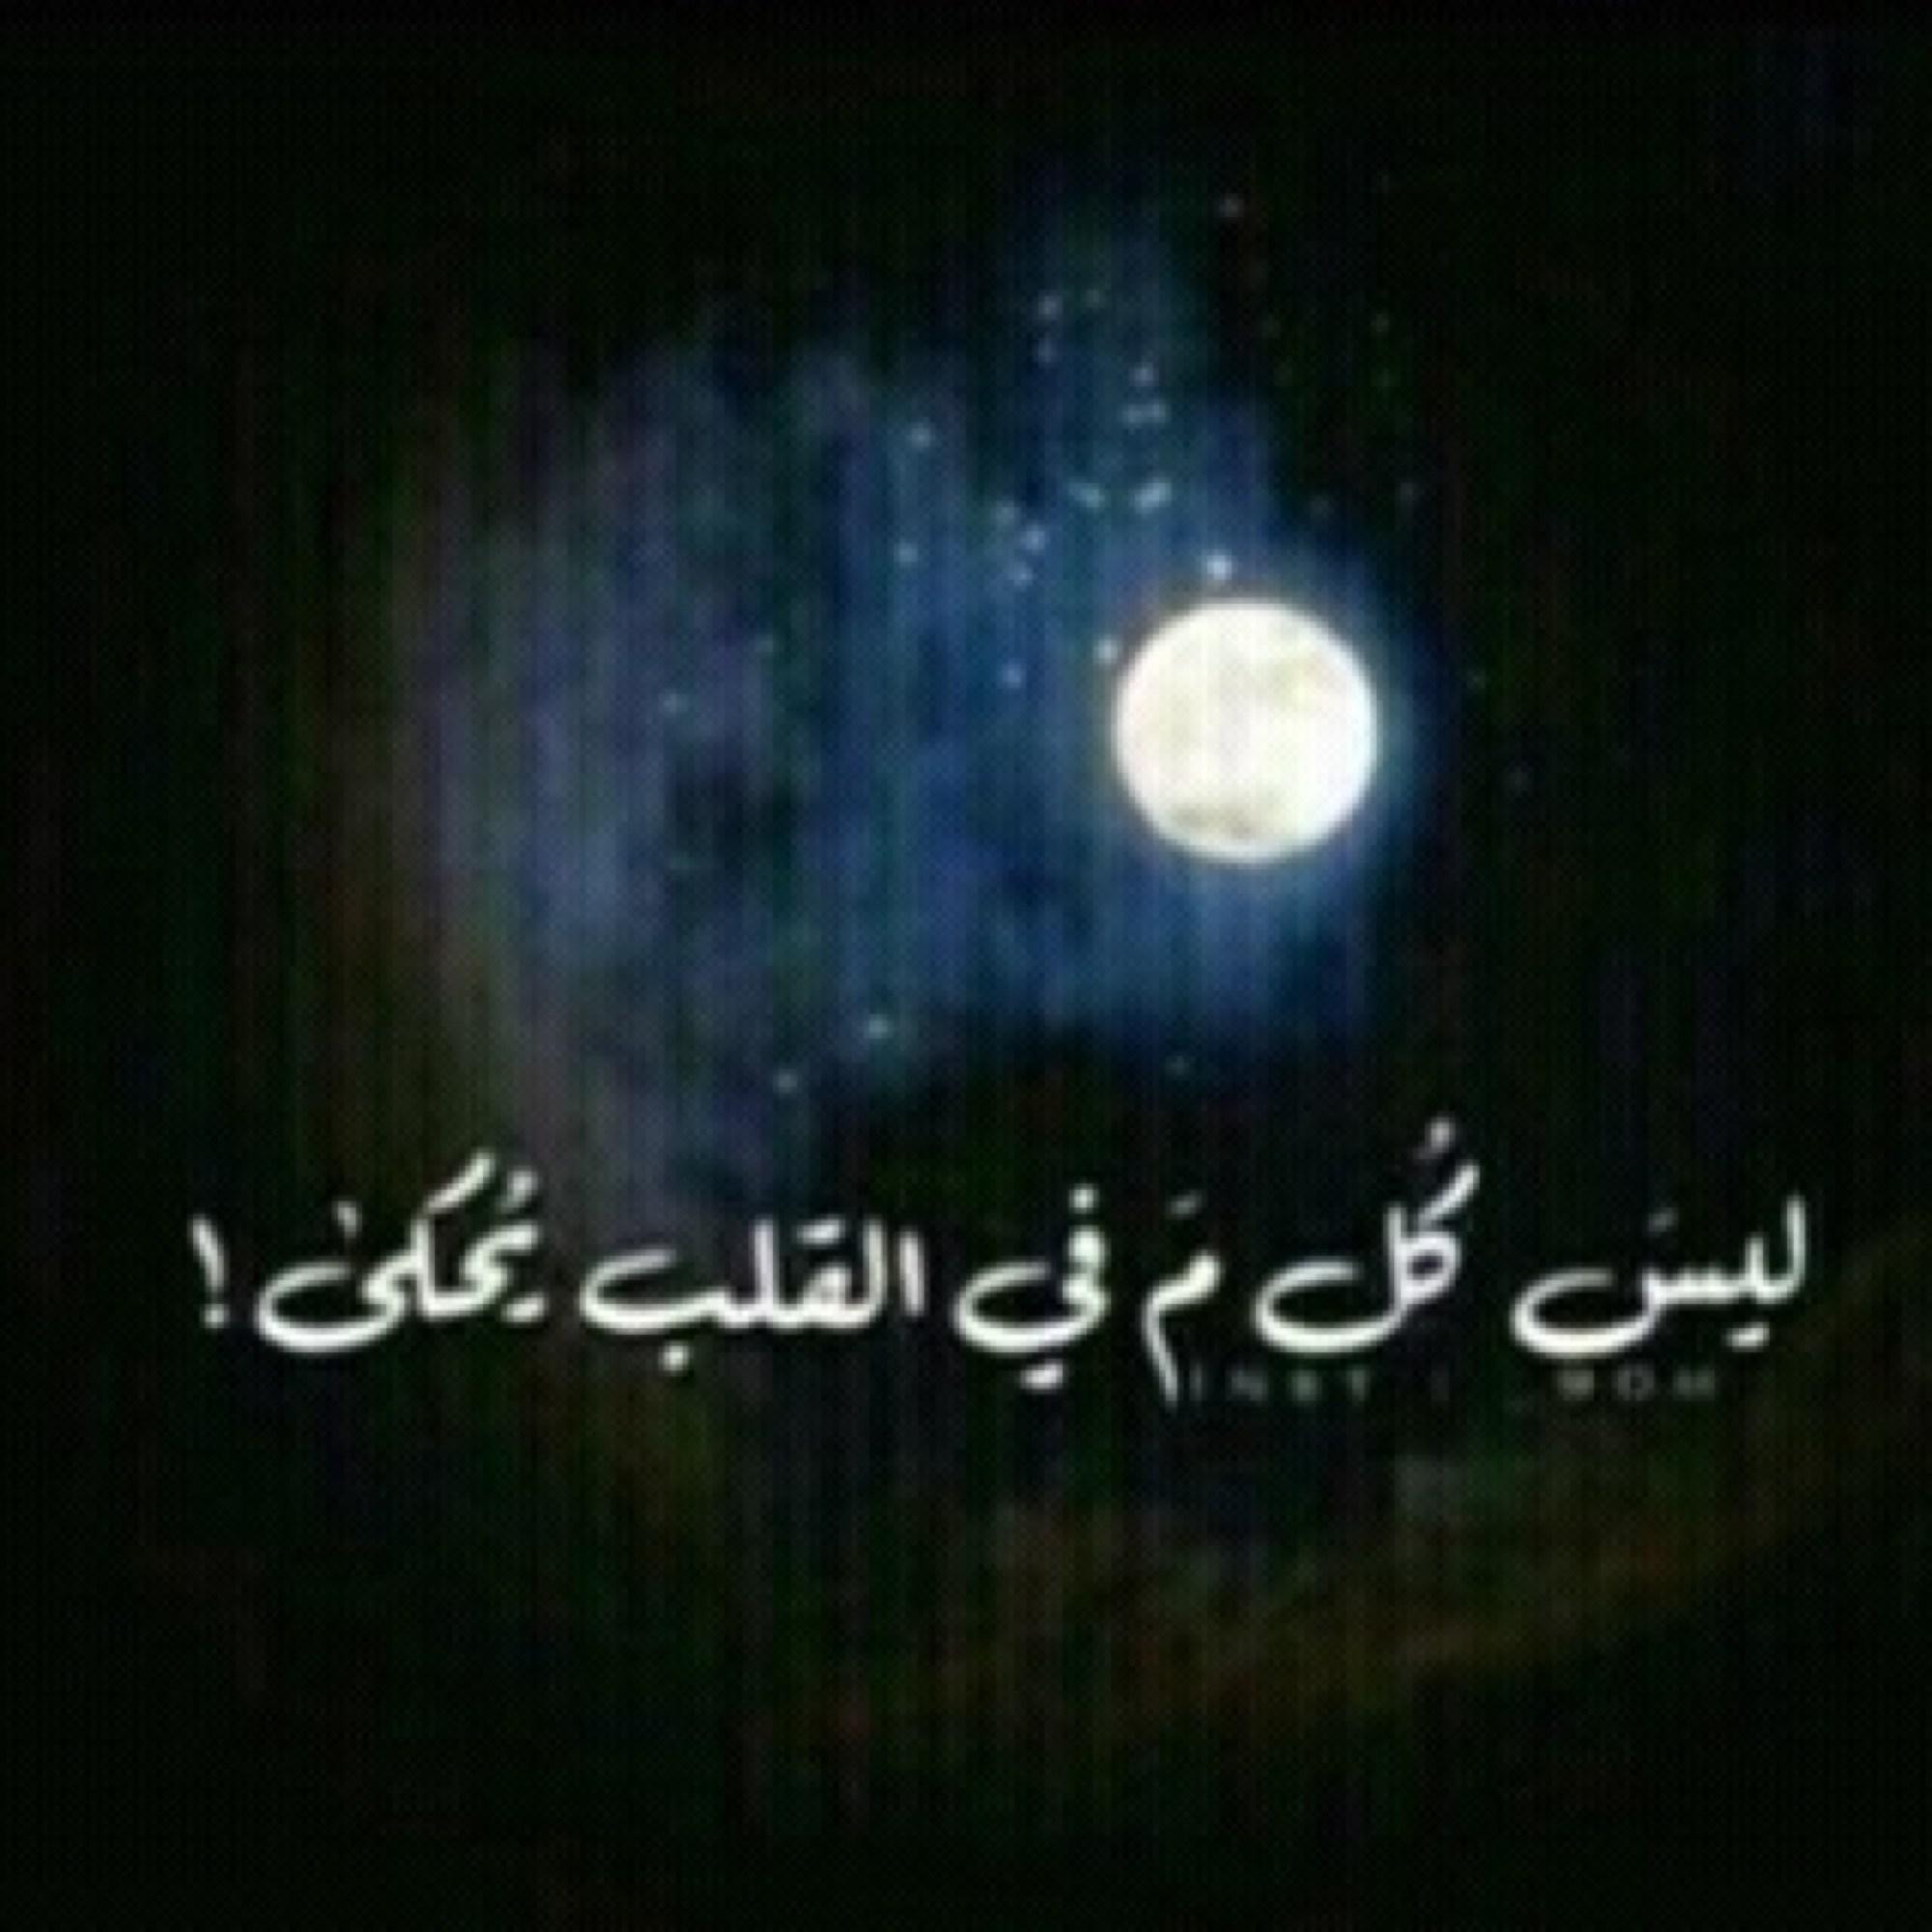 Masooma_alsayed's Cover Photo